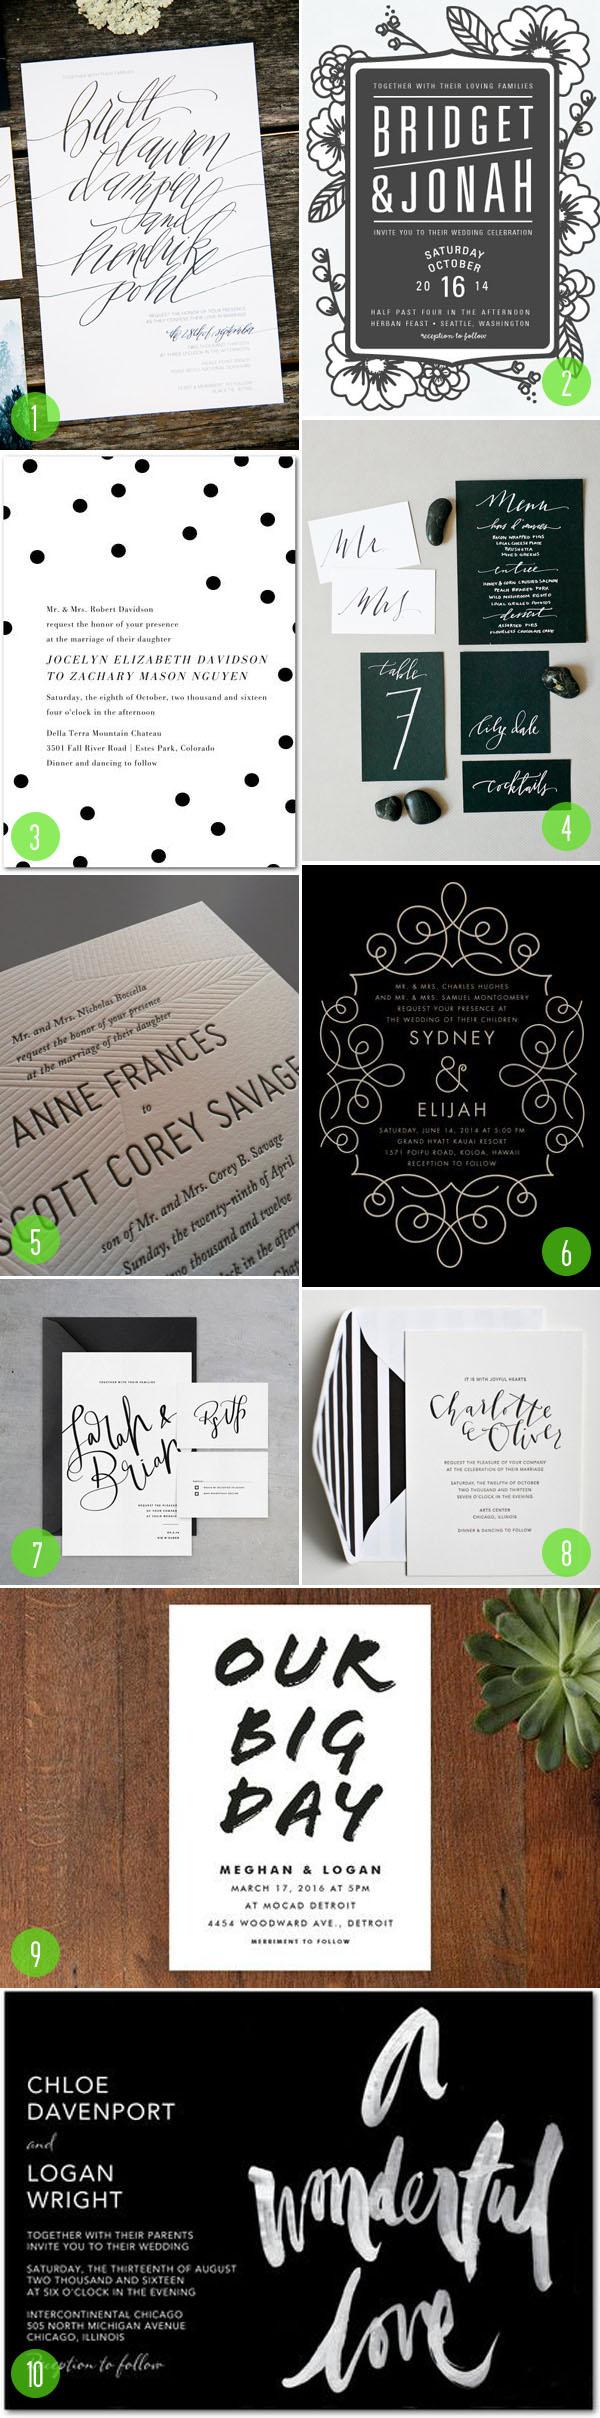 top 10: black and white invitations 2